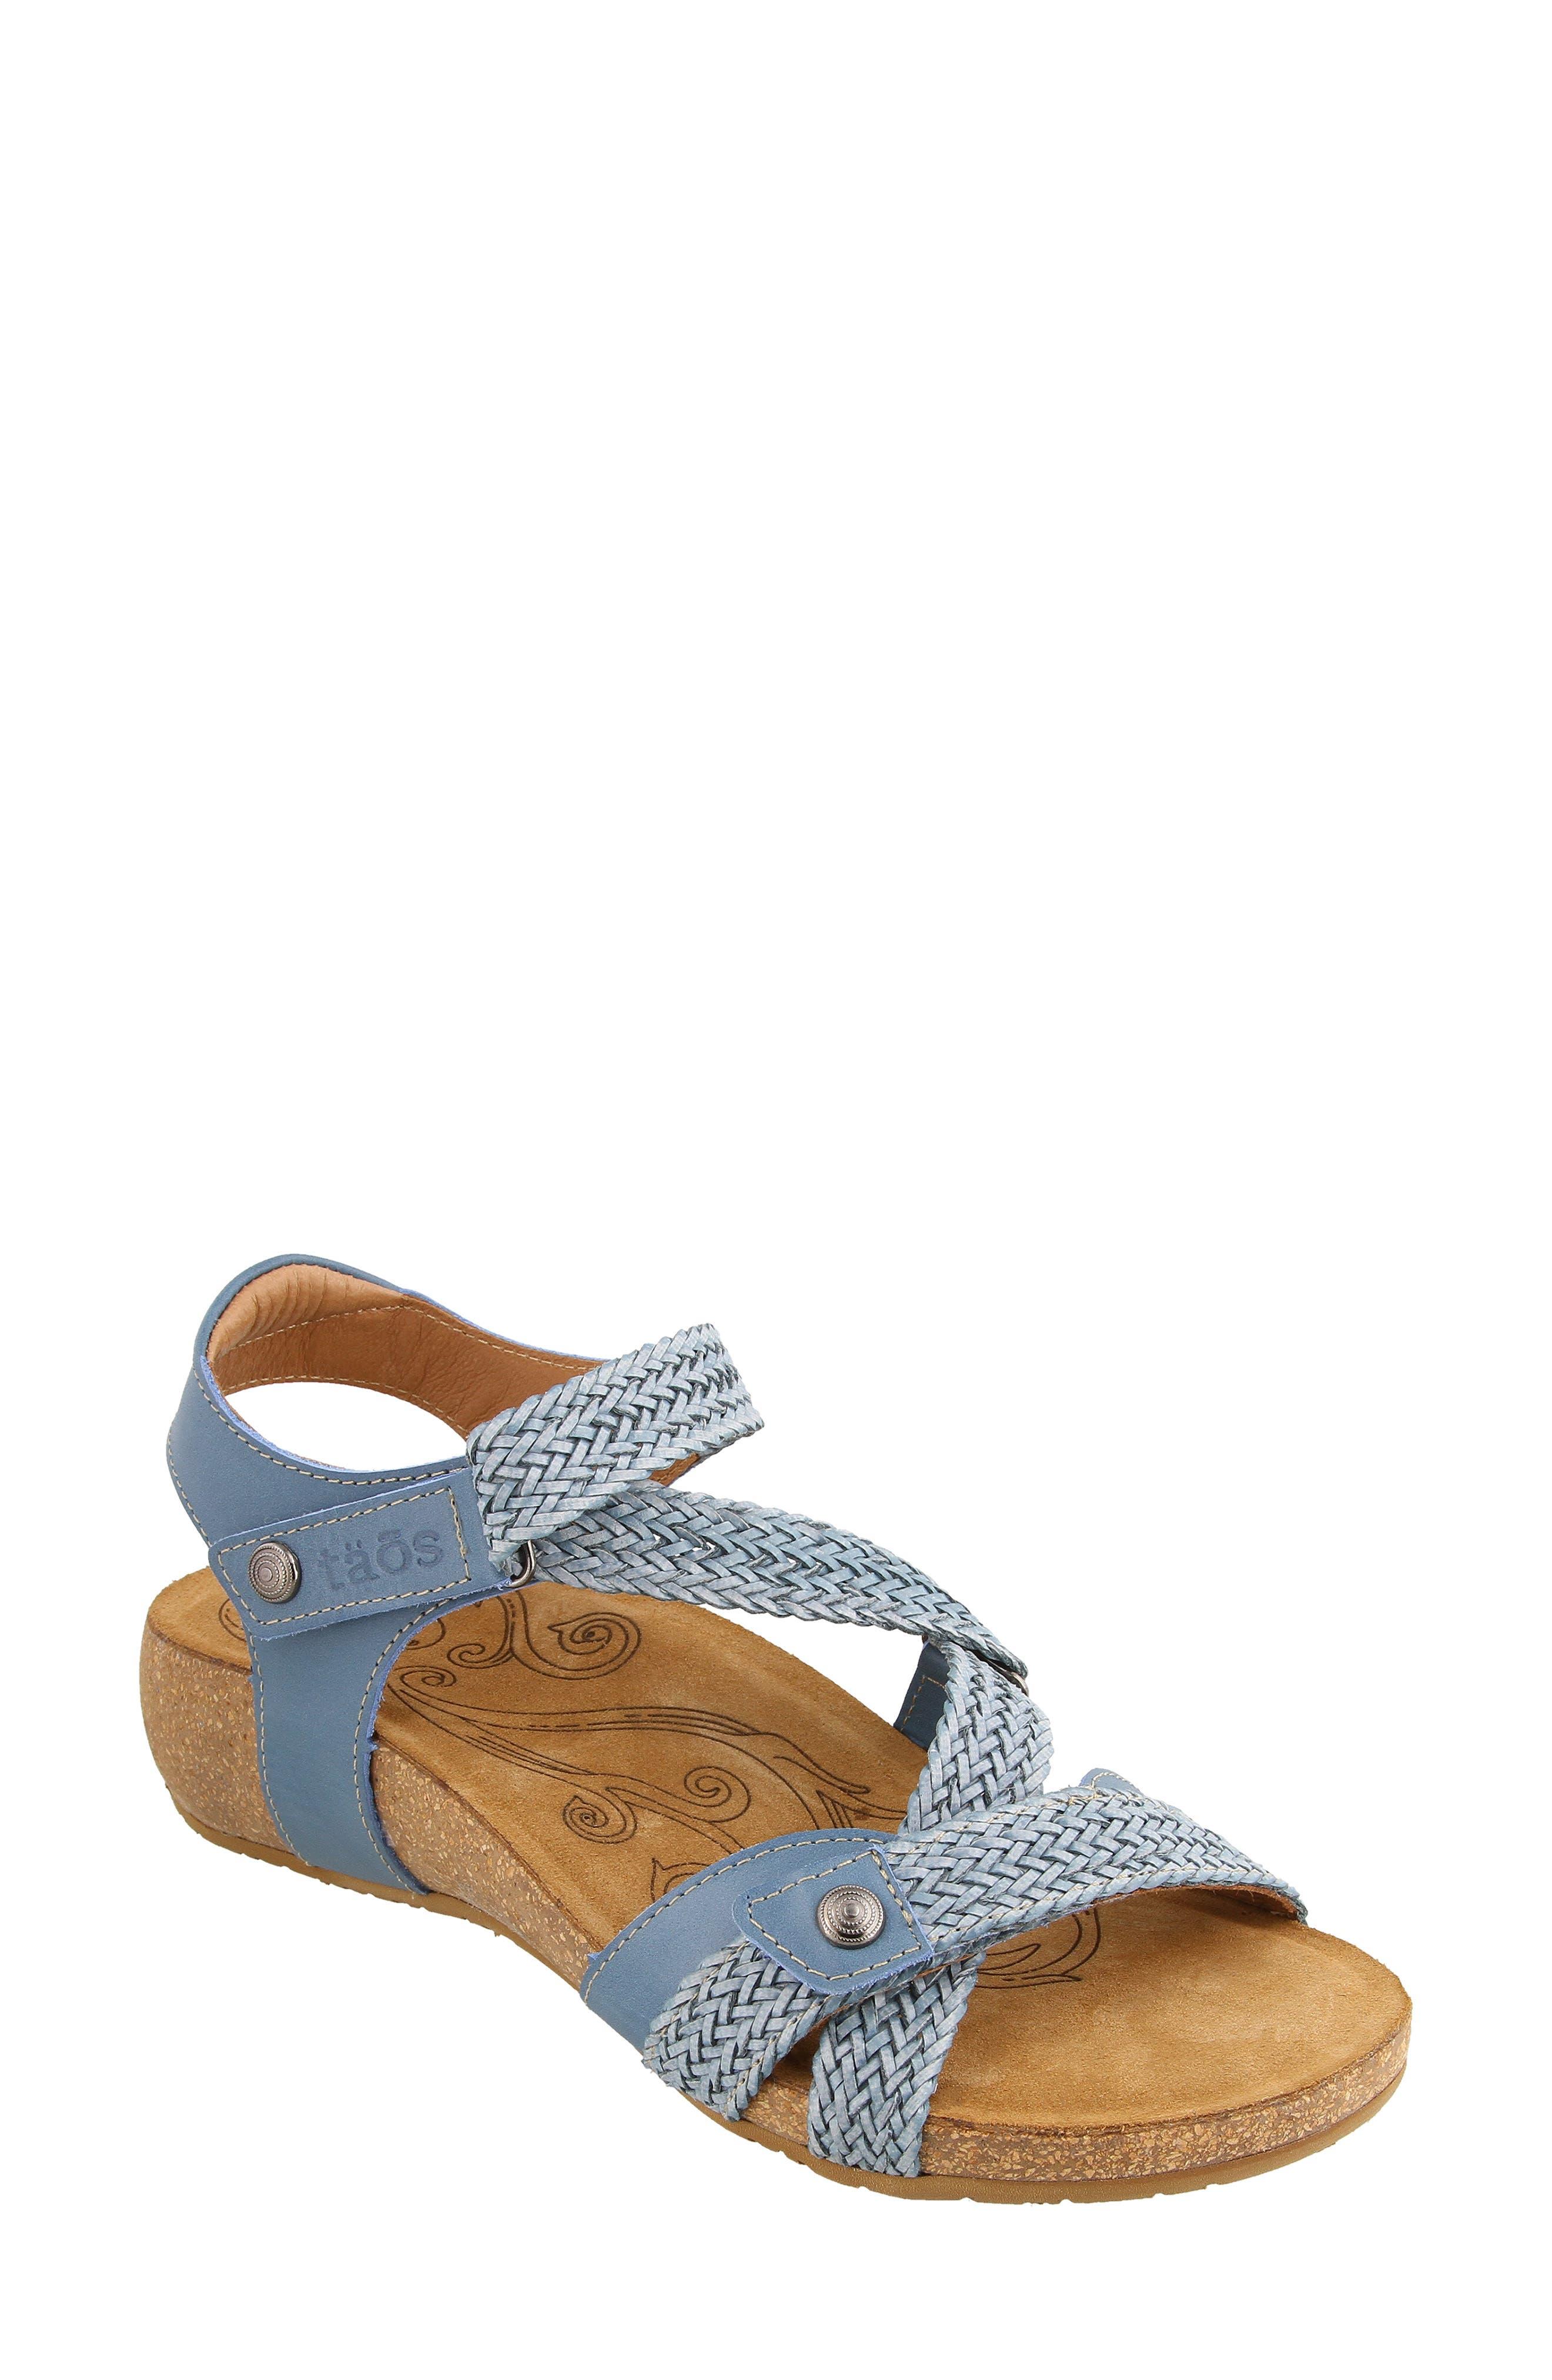 Taos 'Trulie' Wedge Sandal (Women